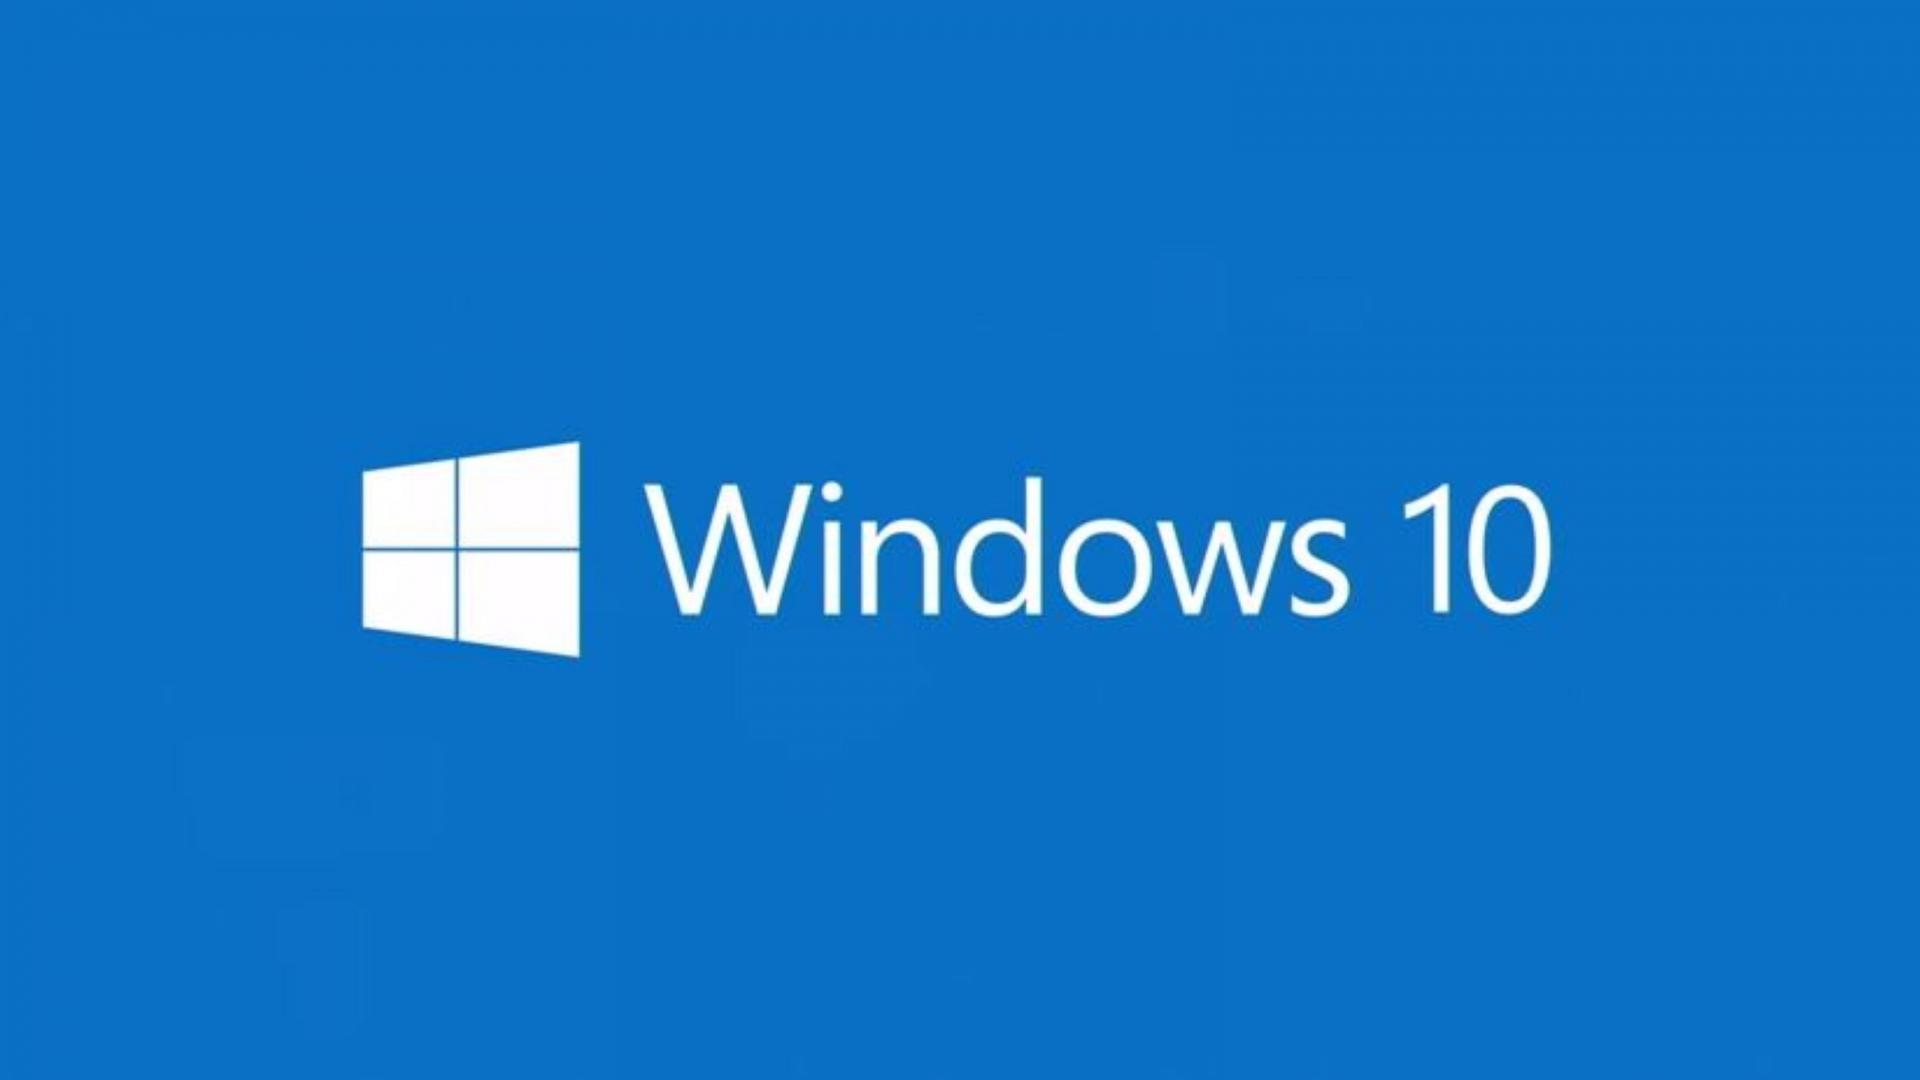 1920x1080 Wallpaper windows 10 technical preview windows 10 logo 1920x1080